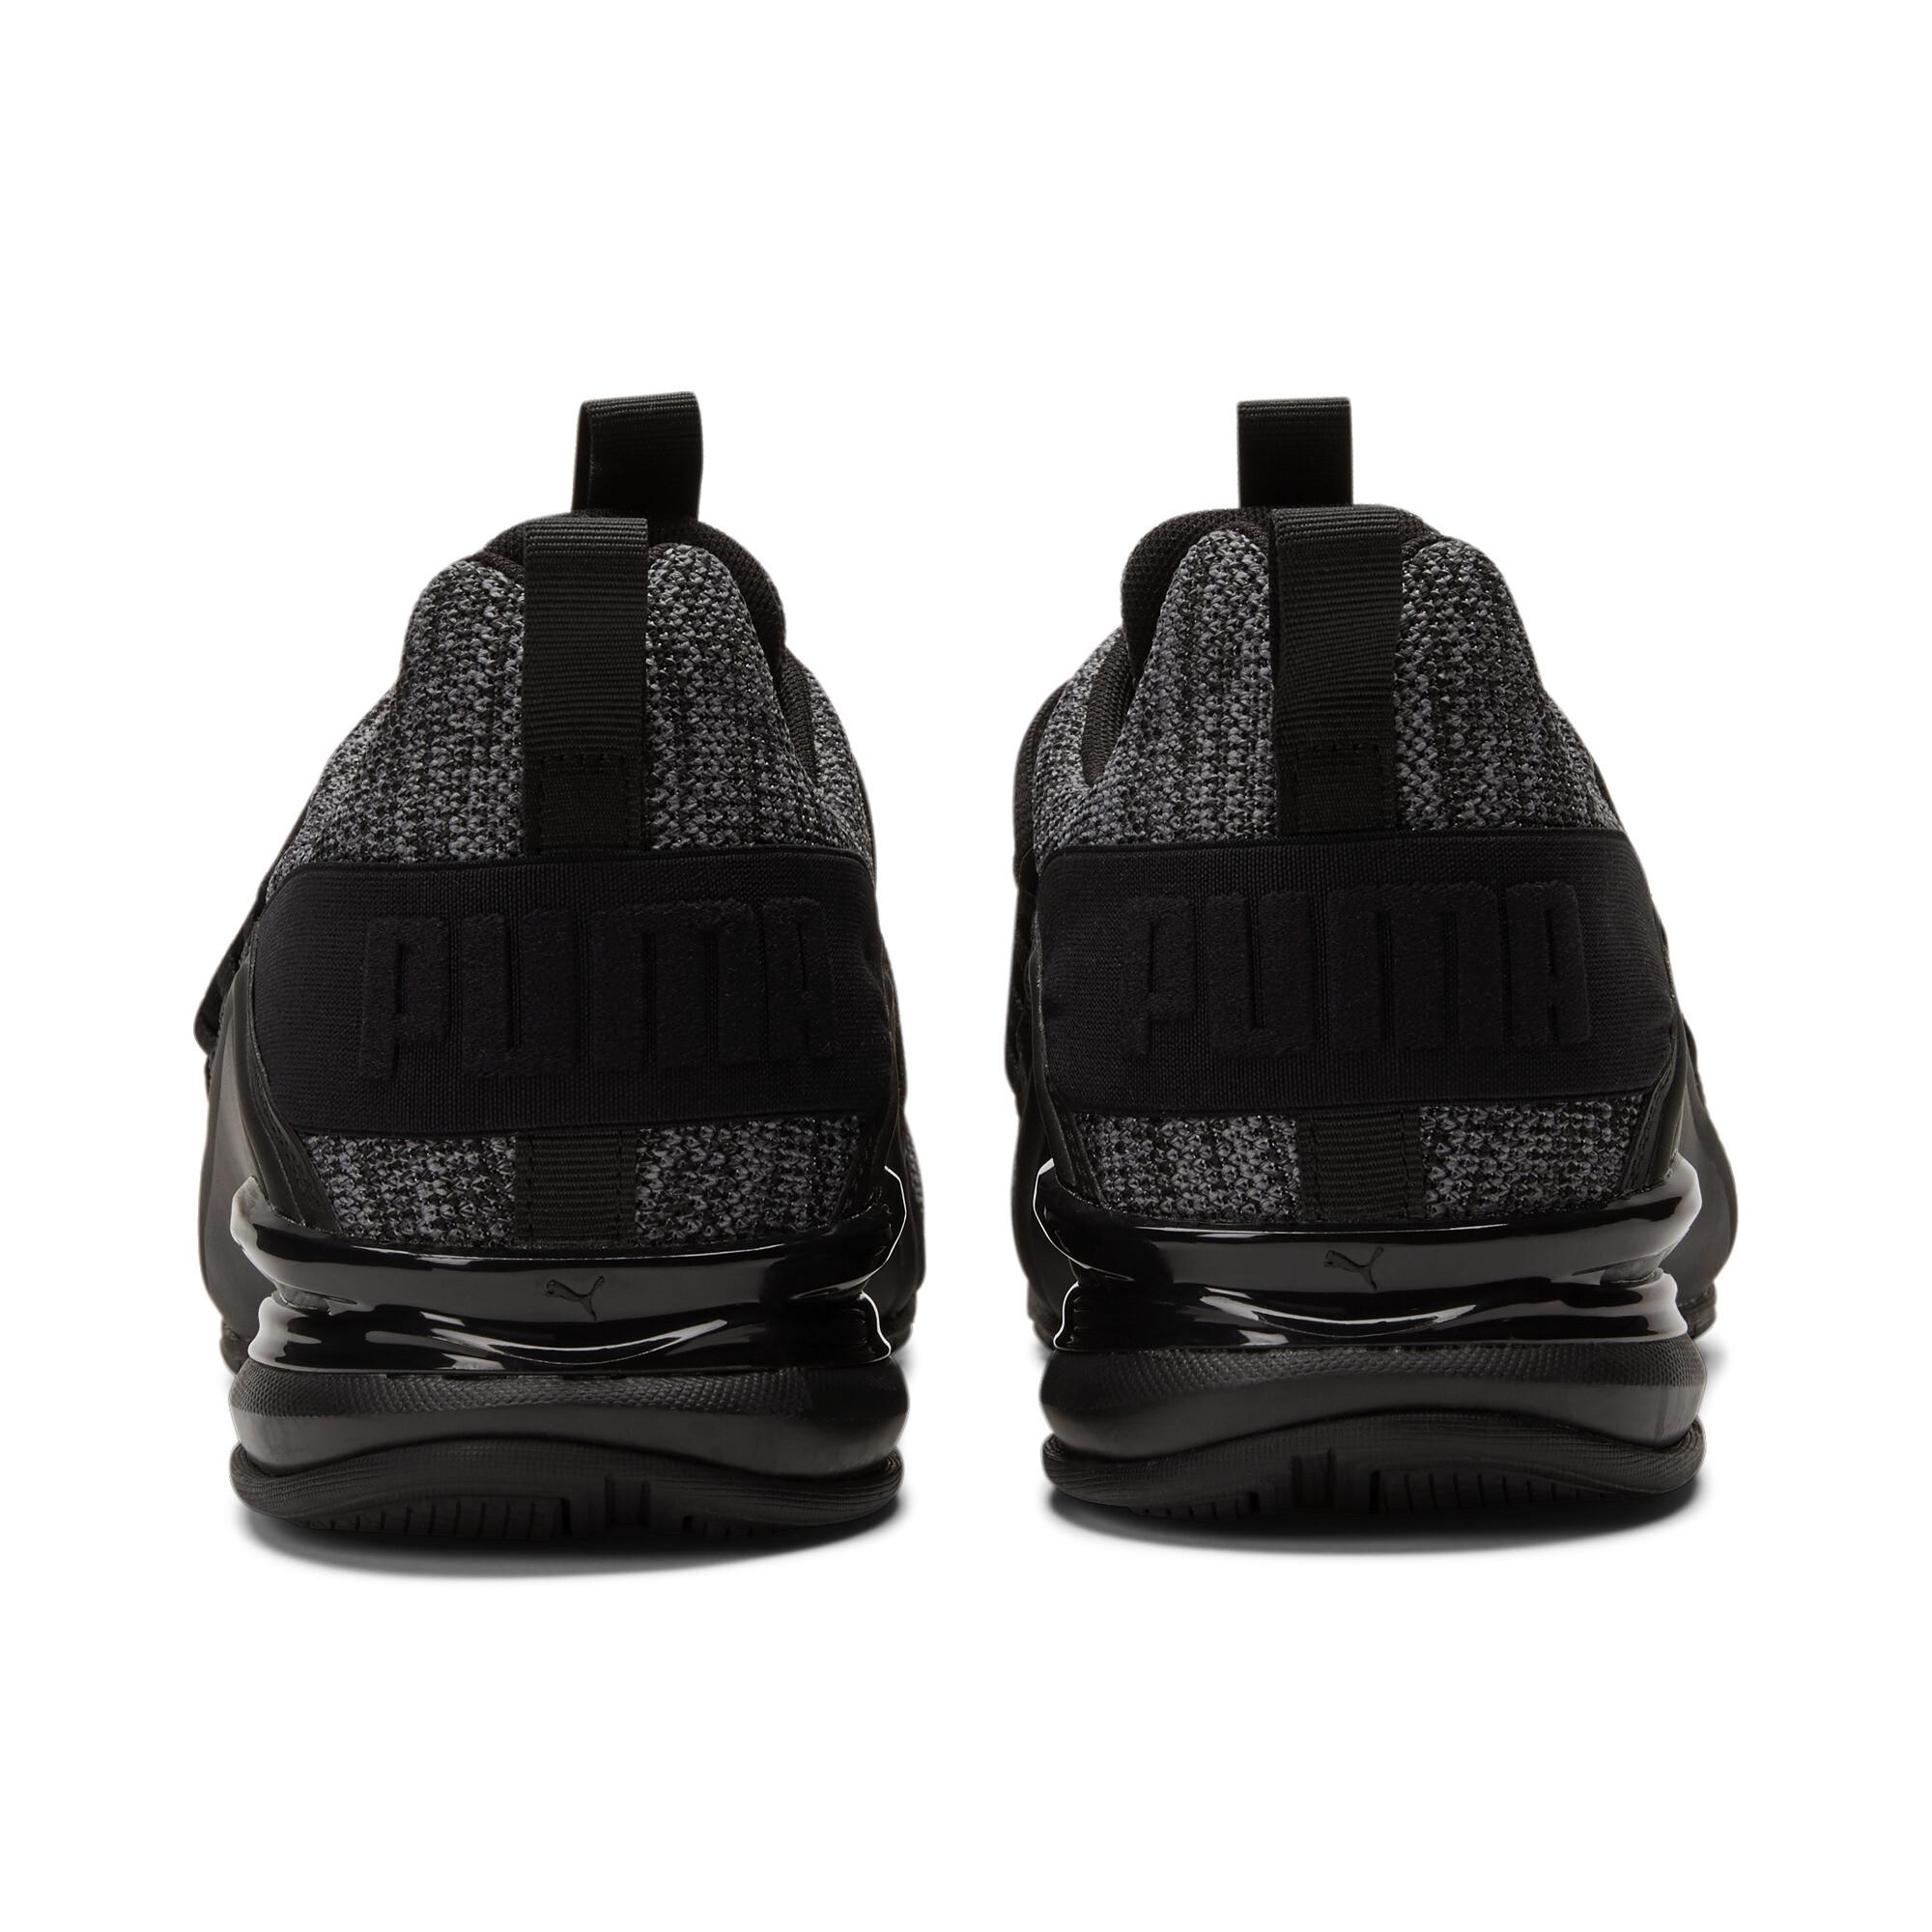 PUMA-Axelion-Men-039-s-Training-Shoes-Men-Shoe-Running thumbnail 11